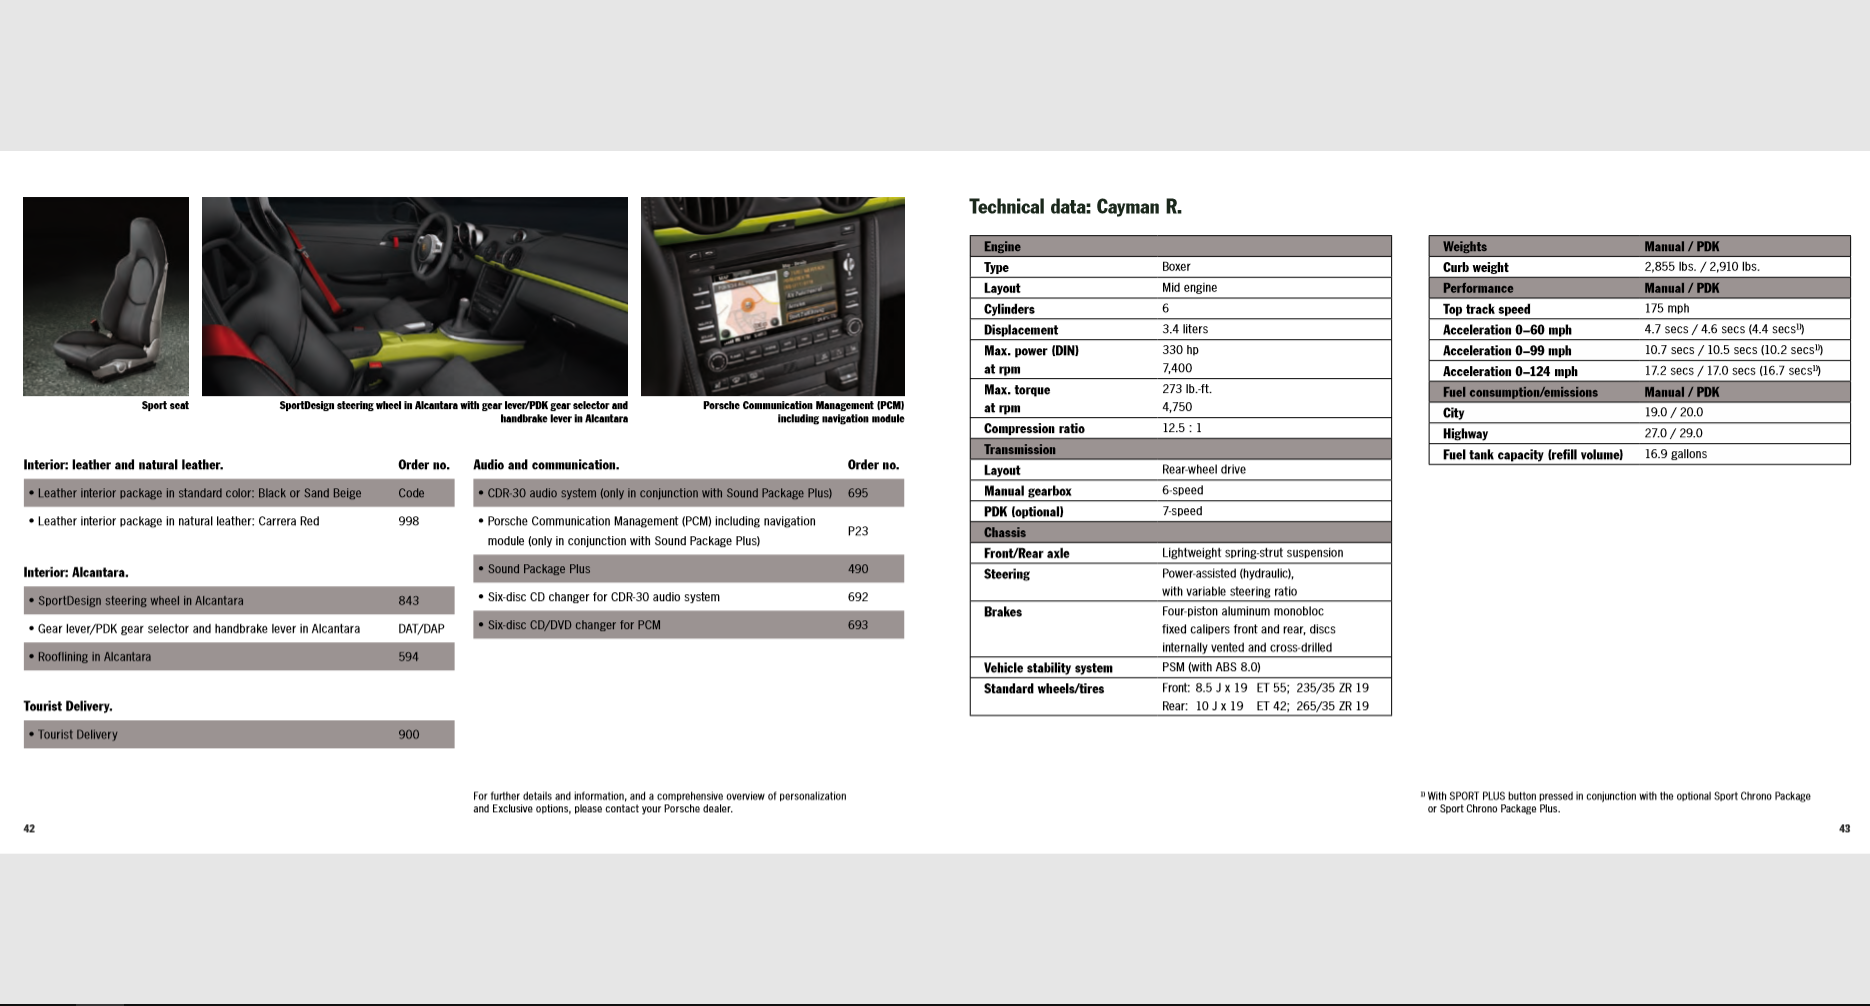 cr_brochure_p20_e93fa07c2ee4a312ec83740dc739a53ad39fdeff.png